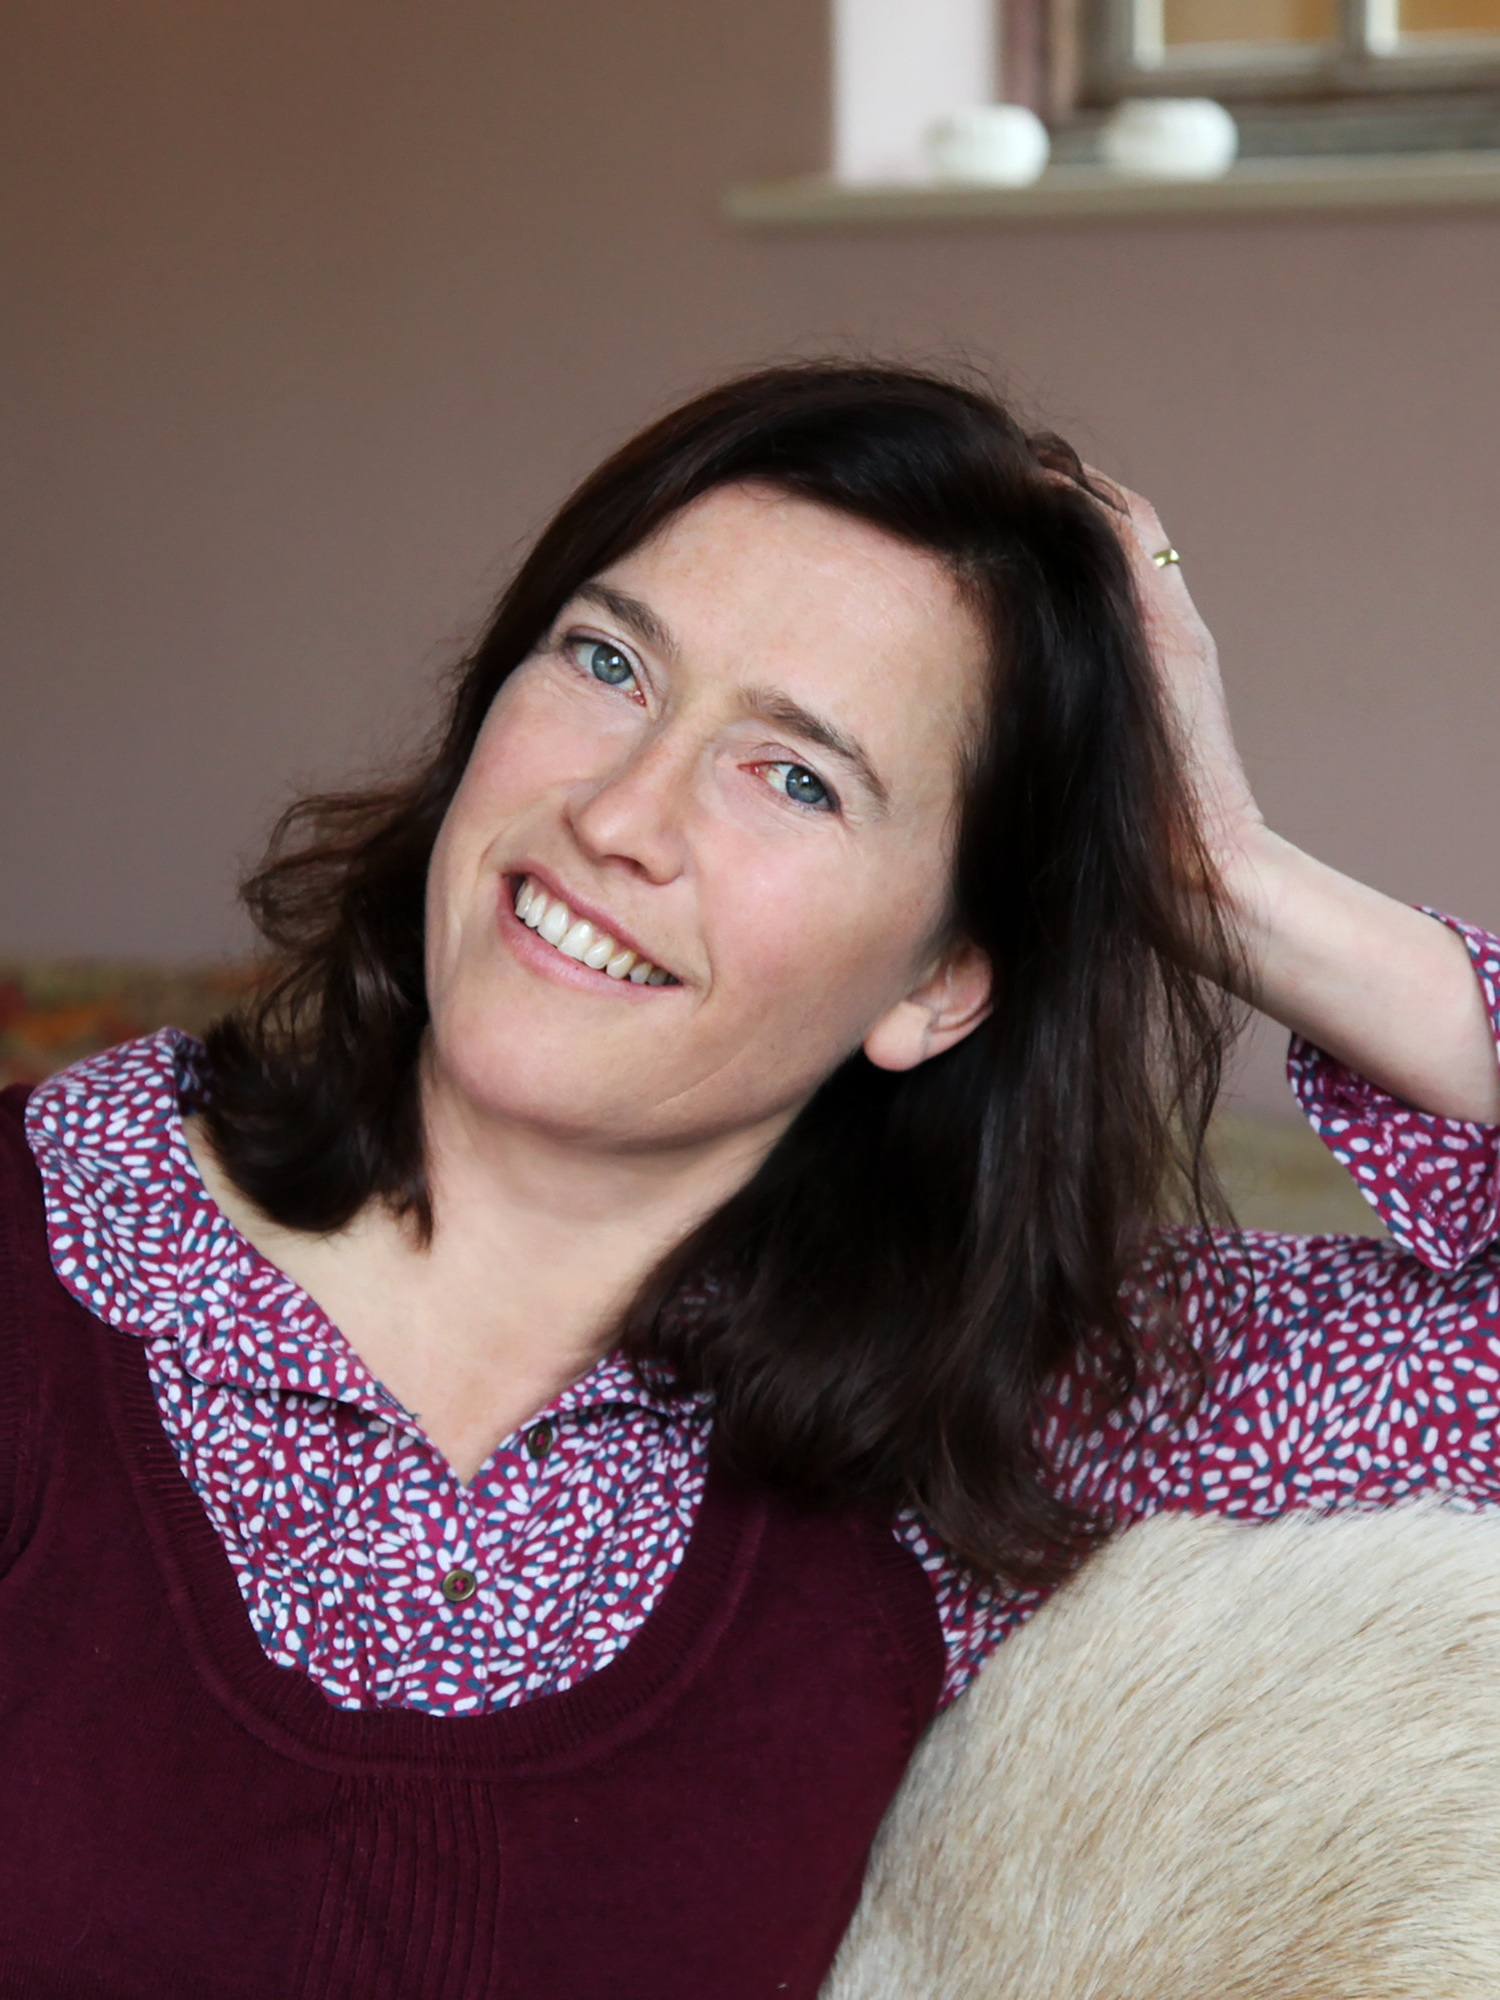 Charlotte Hobson